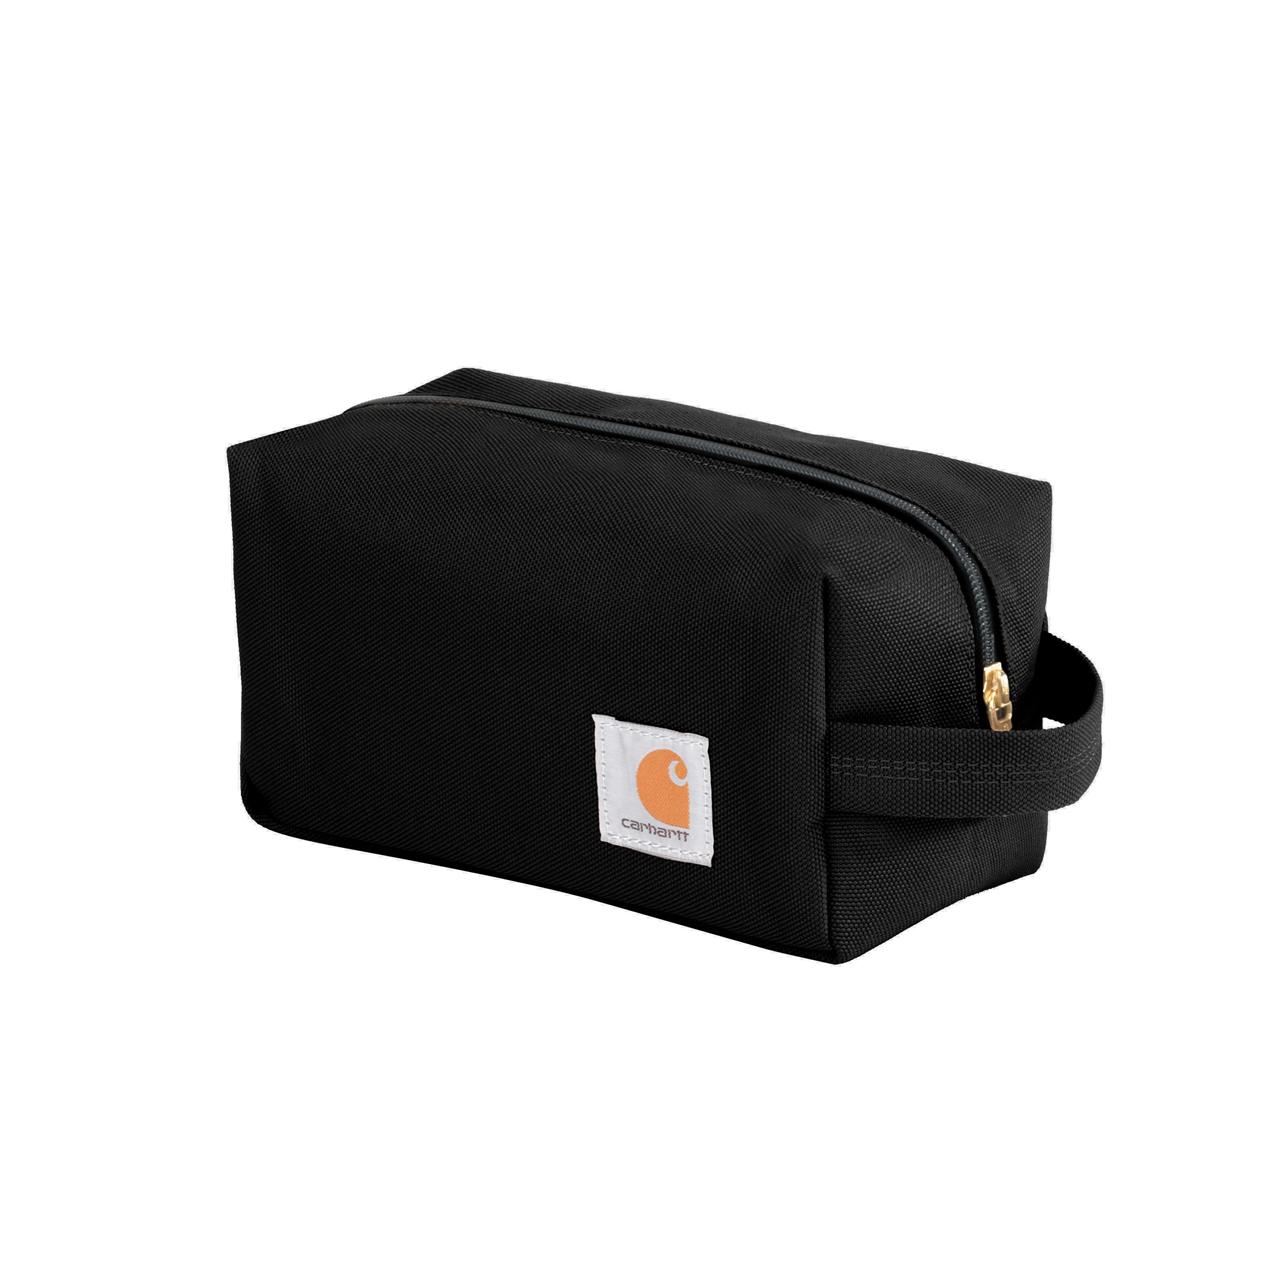 "Køb Carhartt Toiletaske Legacy Travel Kit ""Black"""